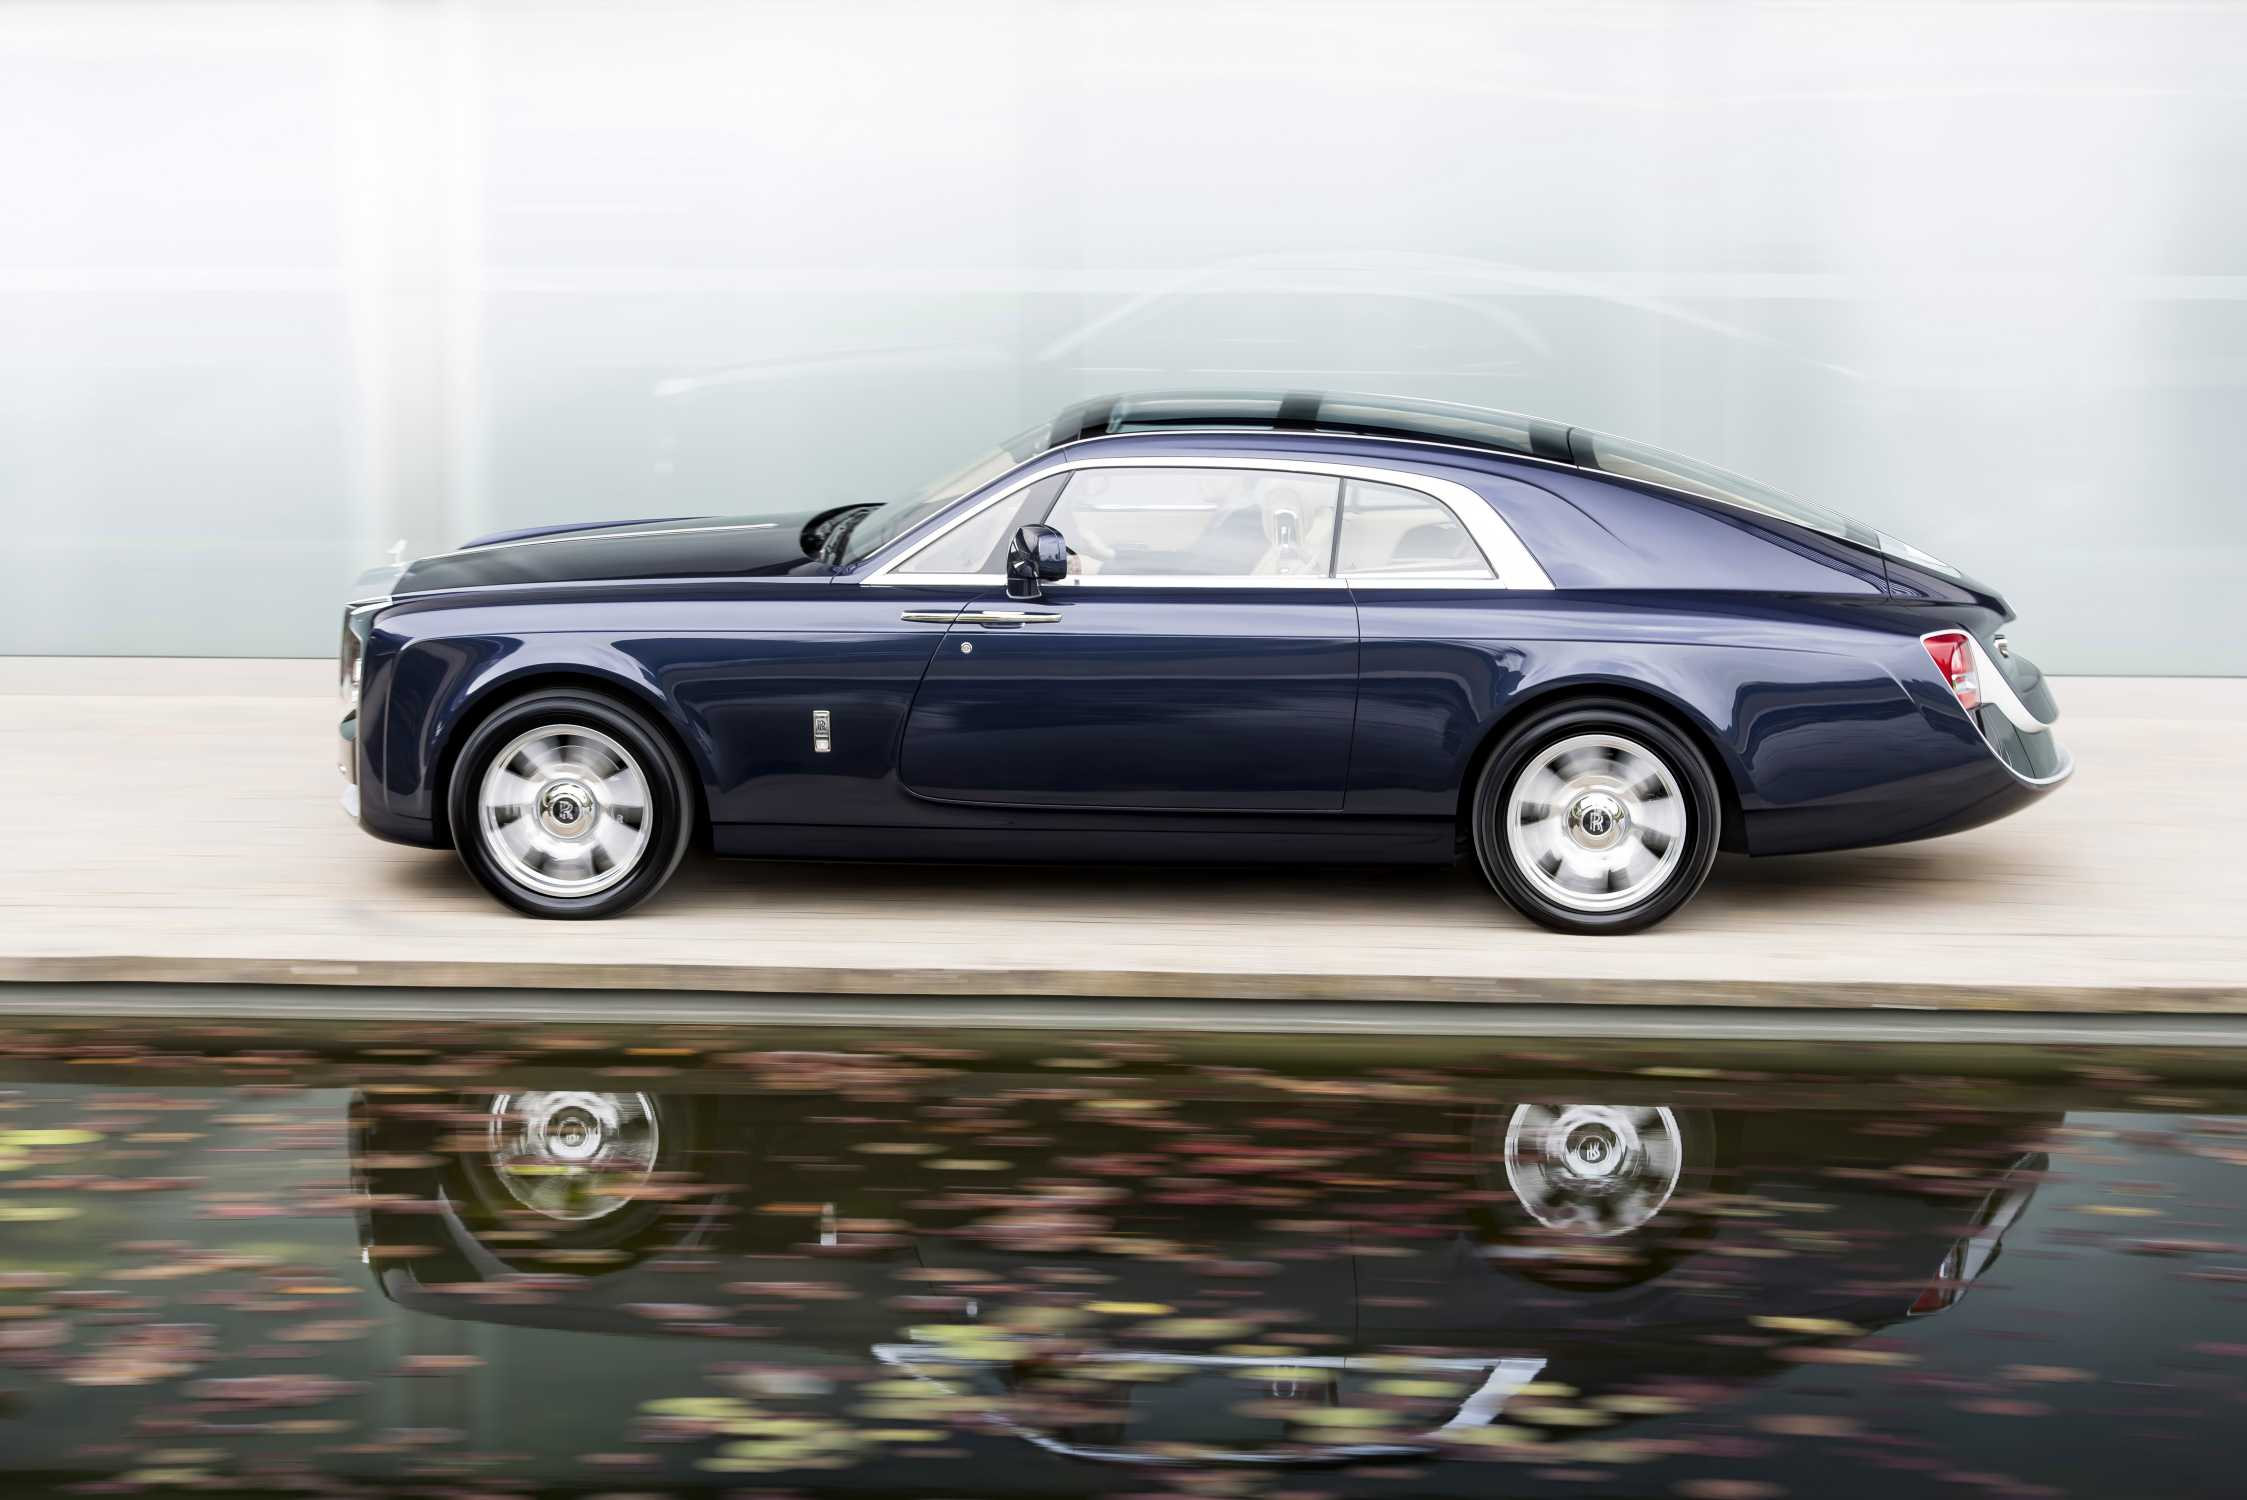 Rolls Royce Motor Cars 2017 The Year Of Bespoke